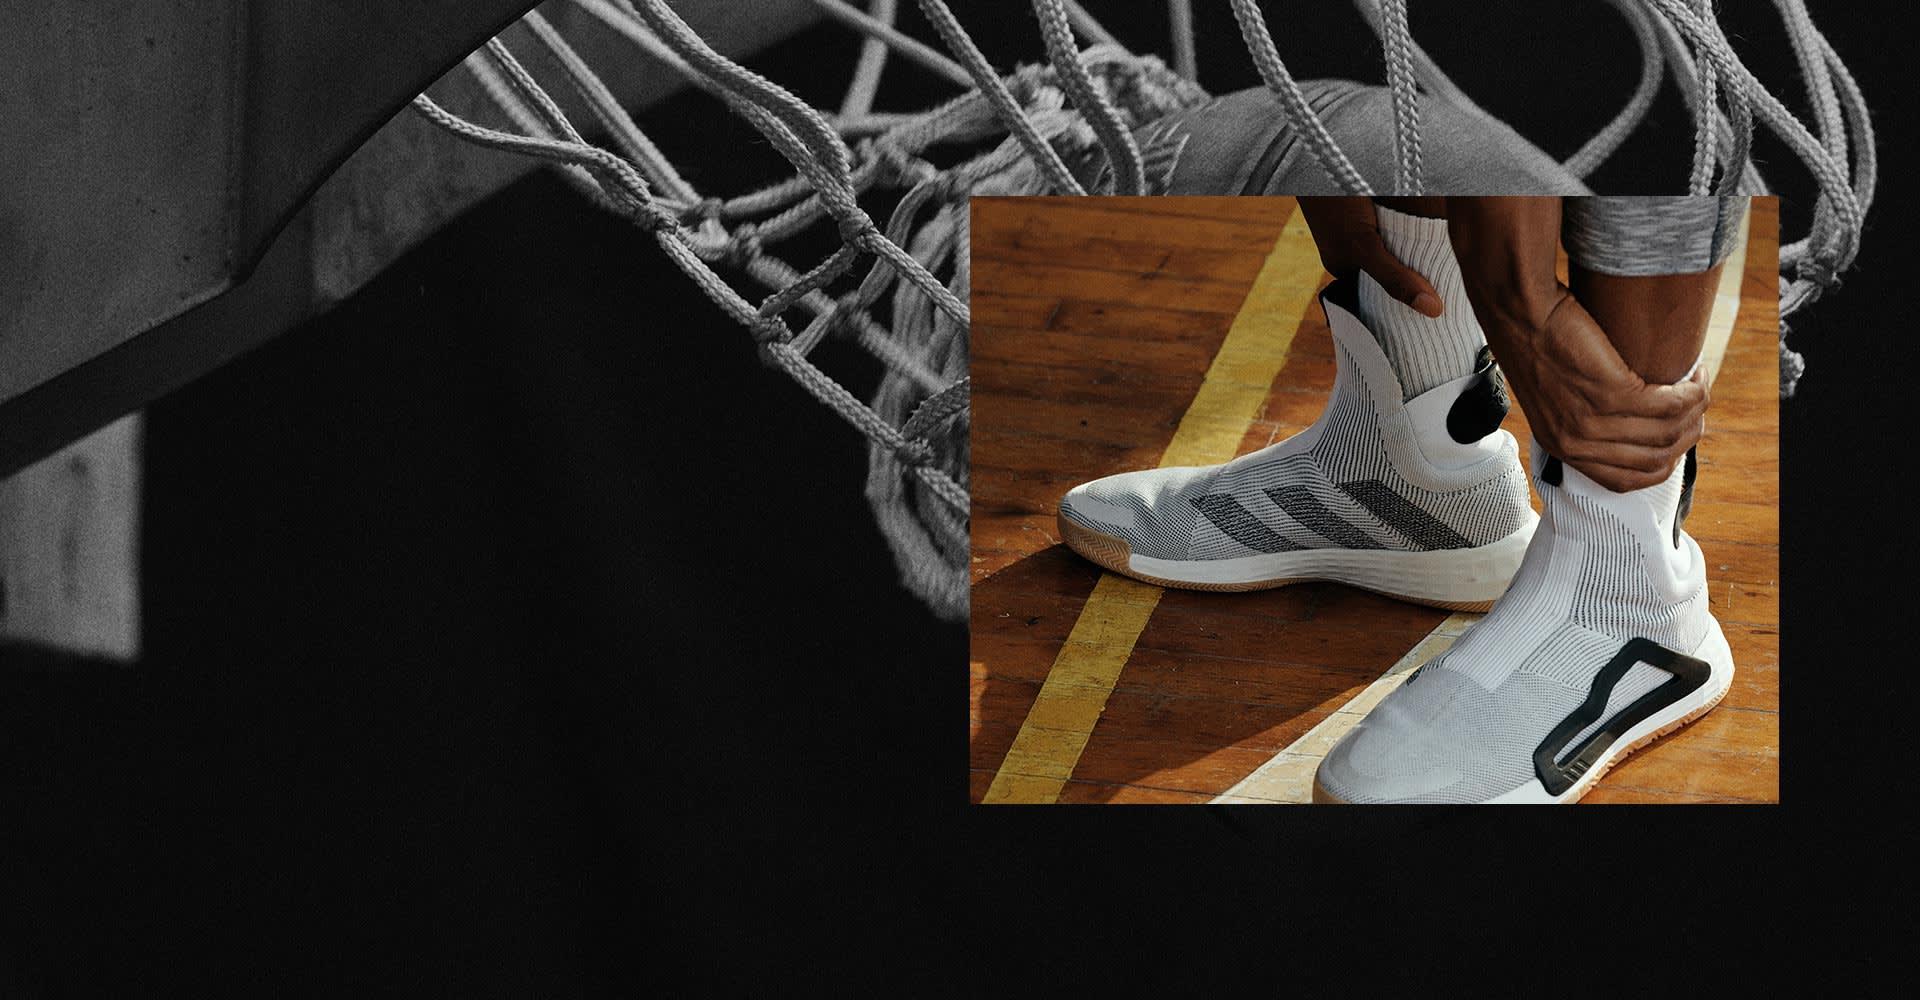 ShoesAdidas Us Us L3v3lLaceless L3v3lLaceless ShoesAdidas Basketball N3xt N3xt Basketball EIW9D2H